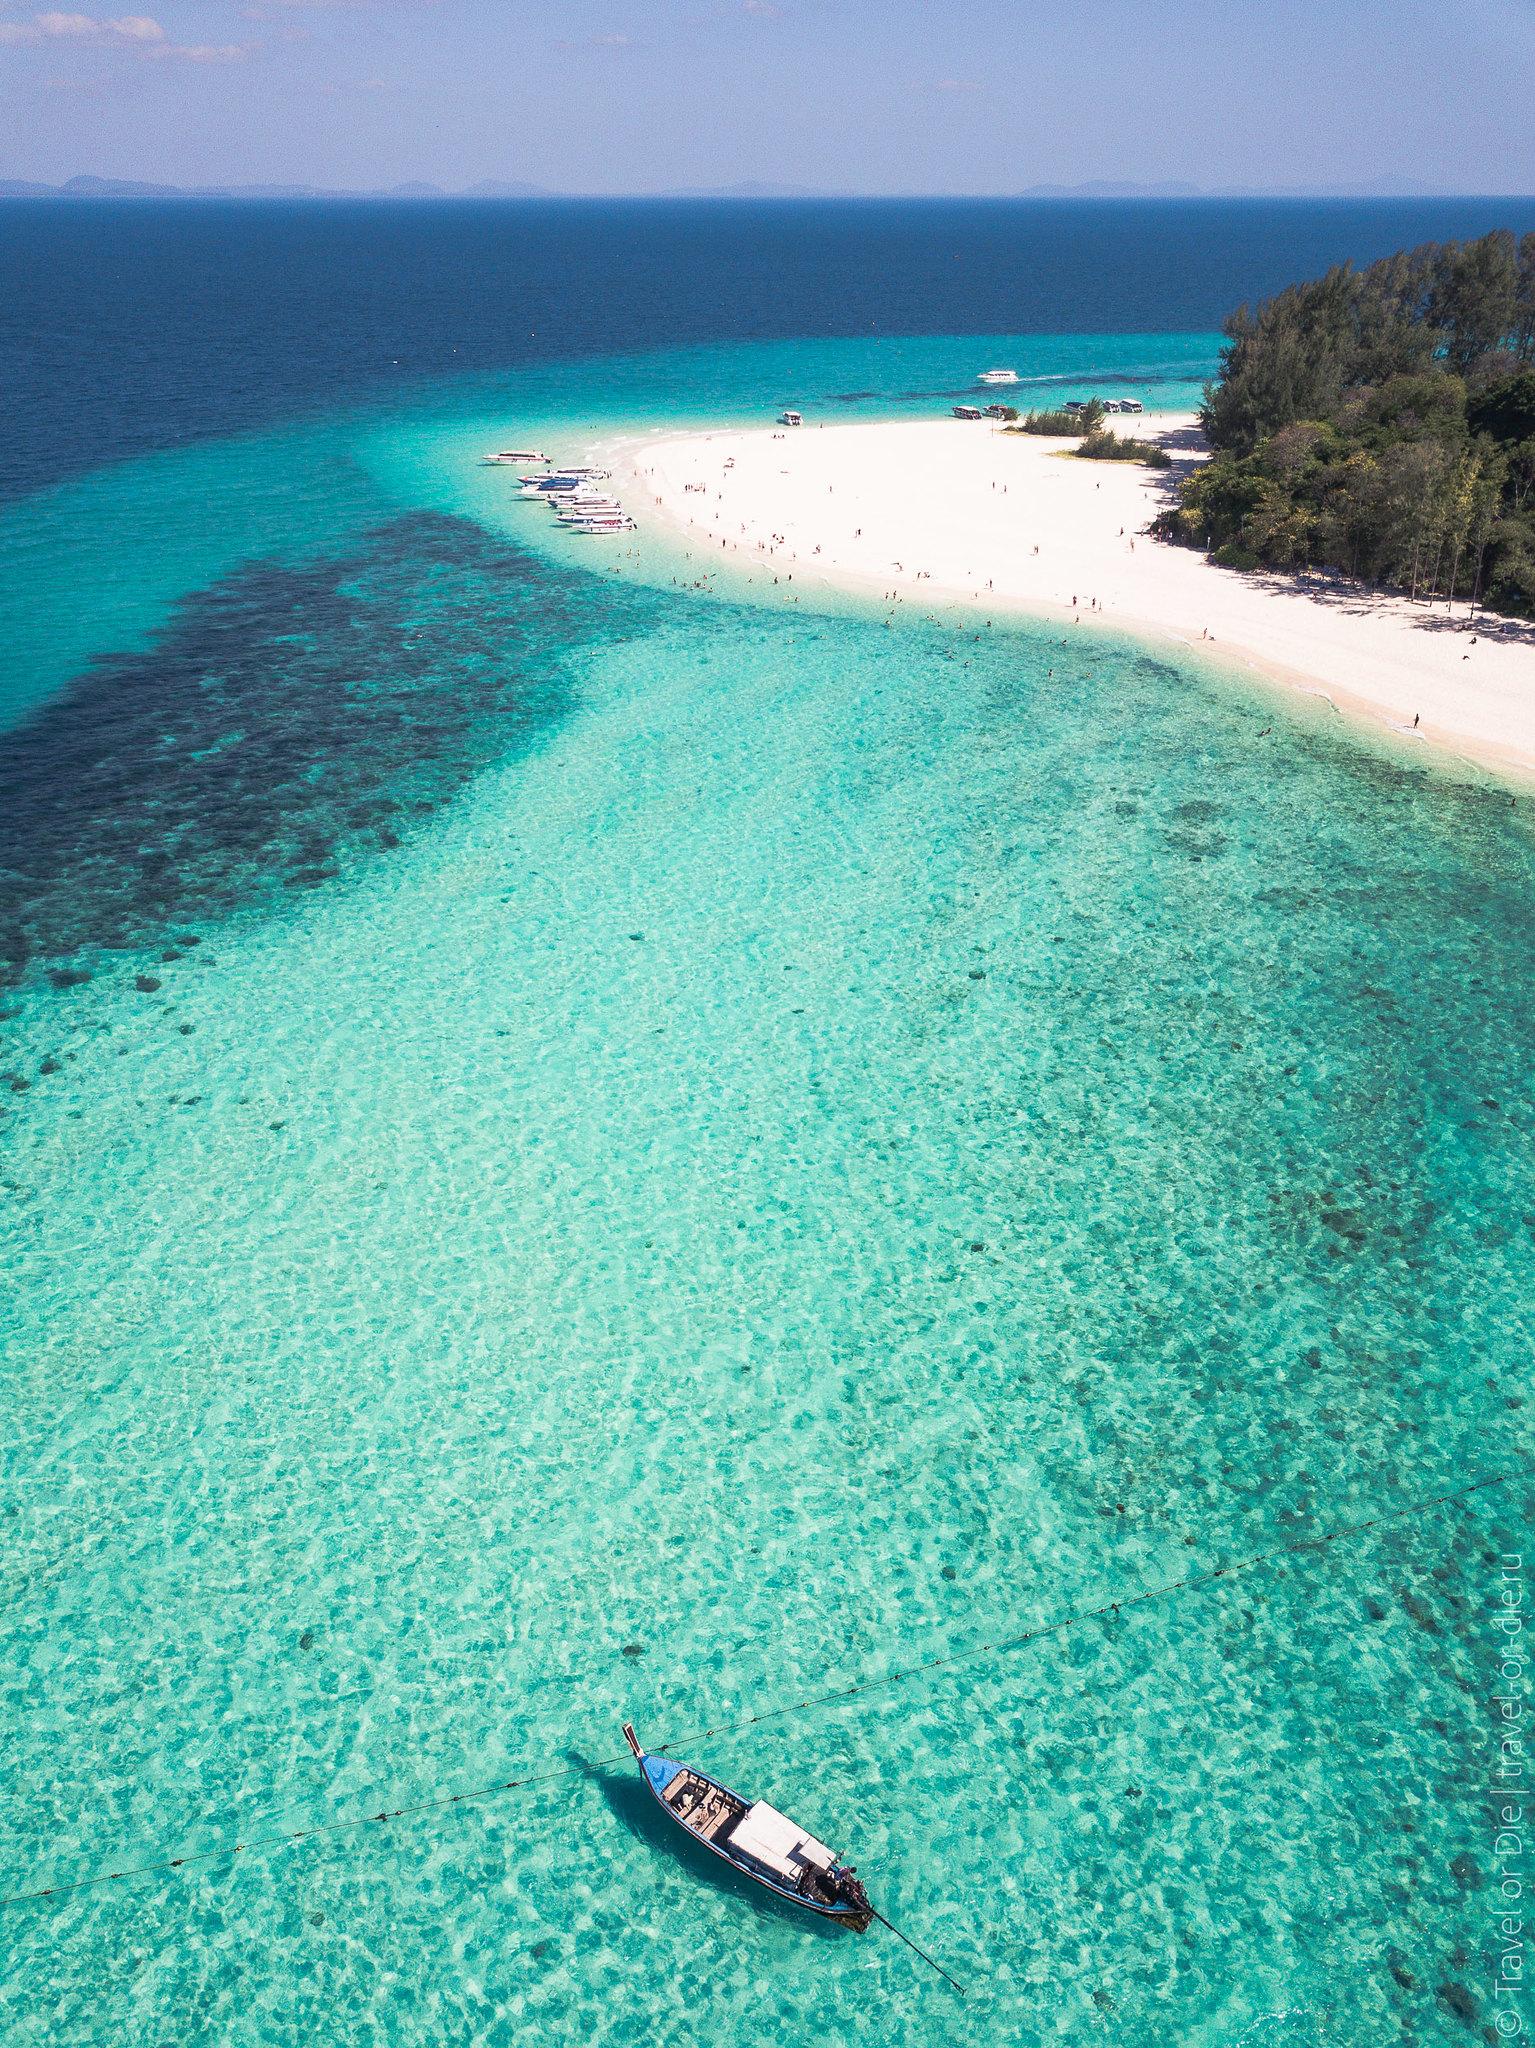 Bamboo-Island-остров-Бамбу-Thailand-mavic-0826